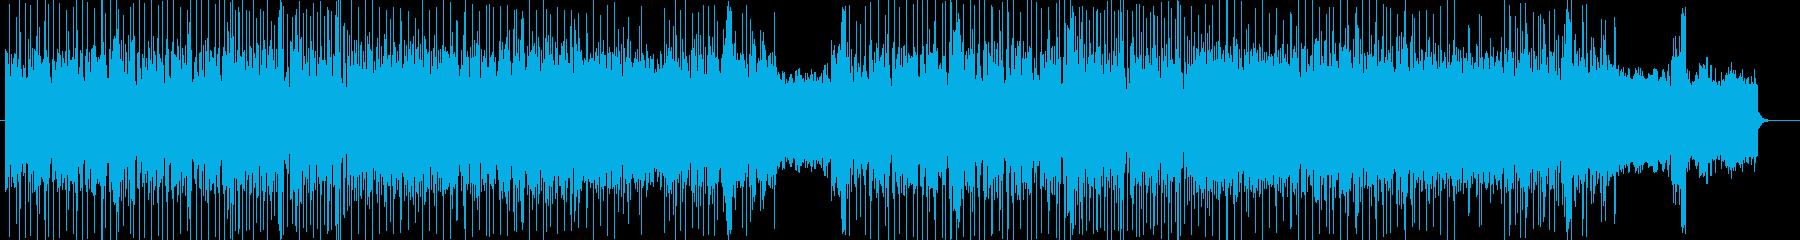 HARD/DARK/METAL 298の再生済みの波形